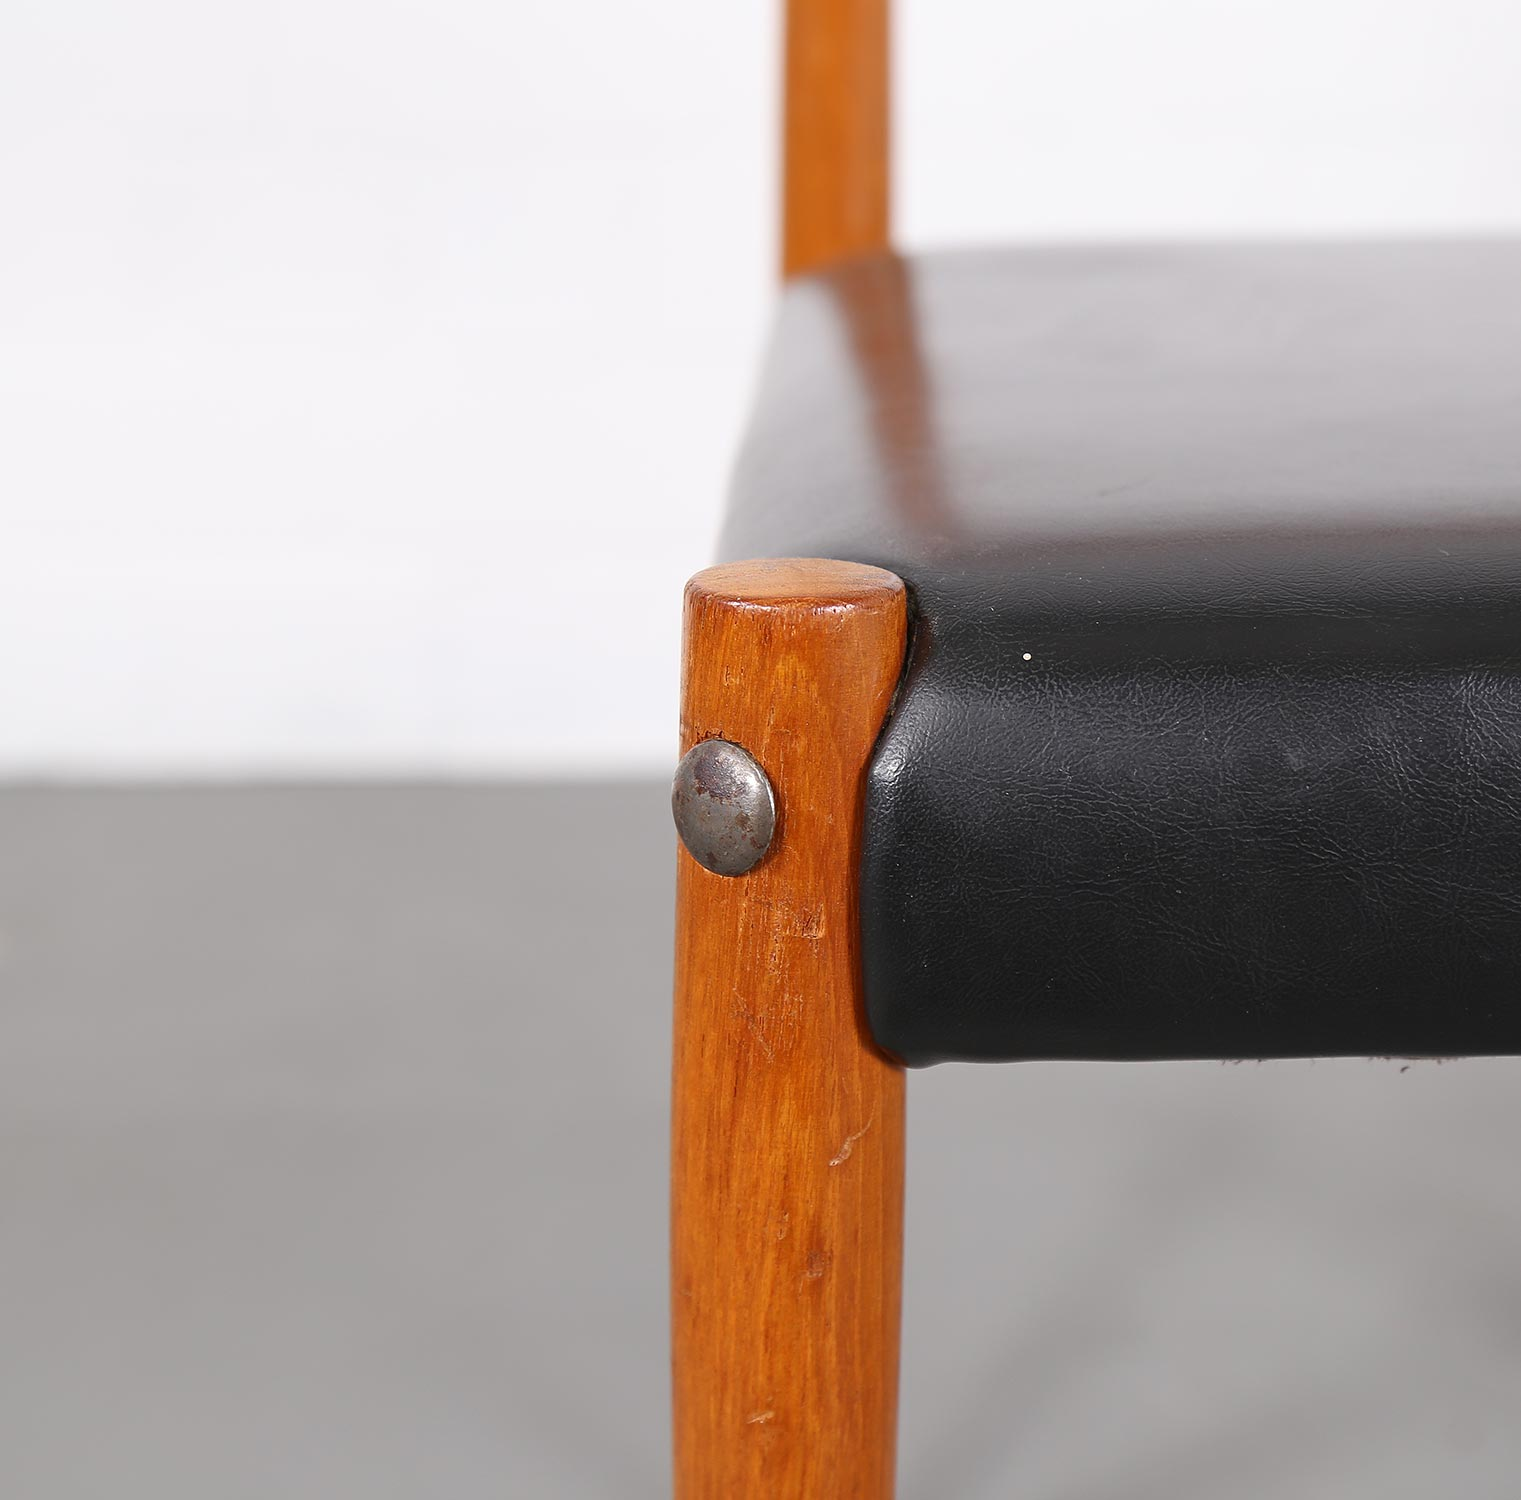 Danish Design Teak Chair 60s Luebke Gebraucht Used Classic Design Furniture 07 Dekaden